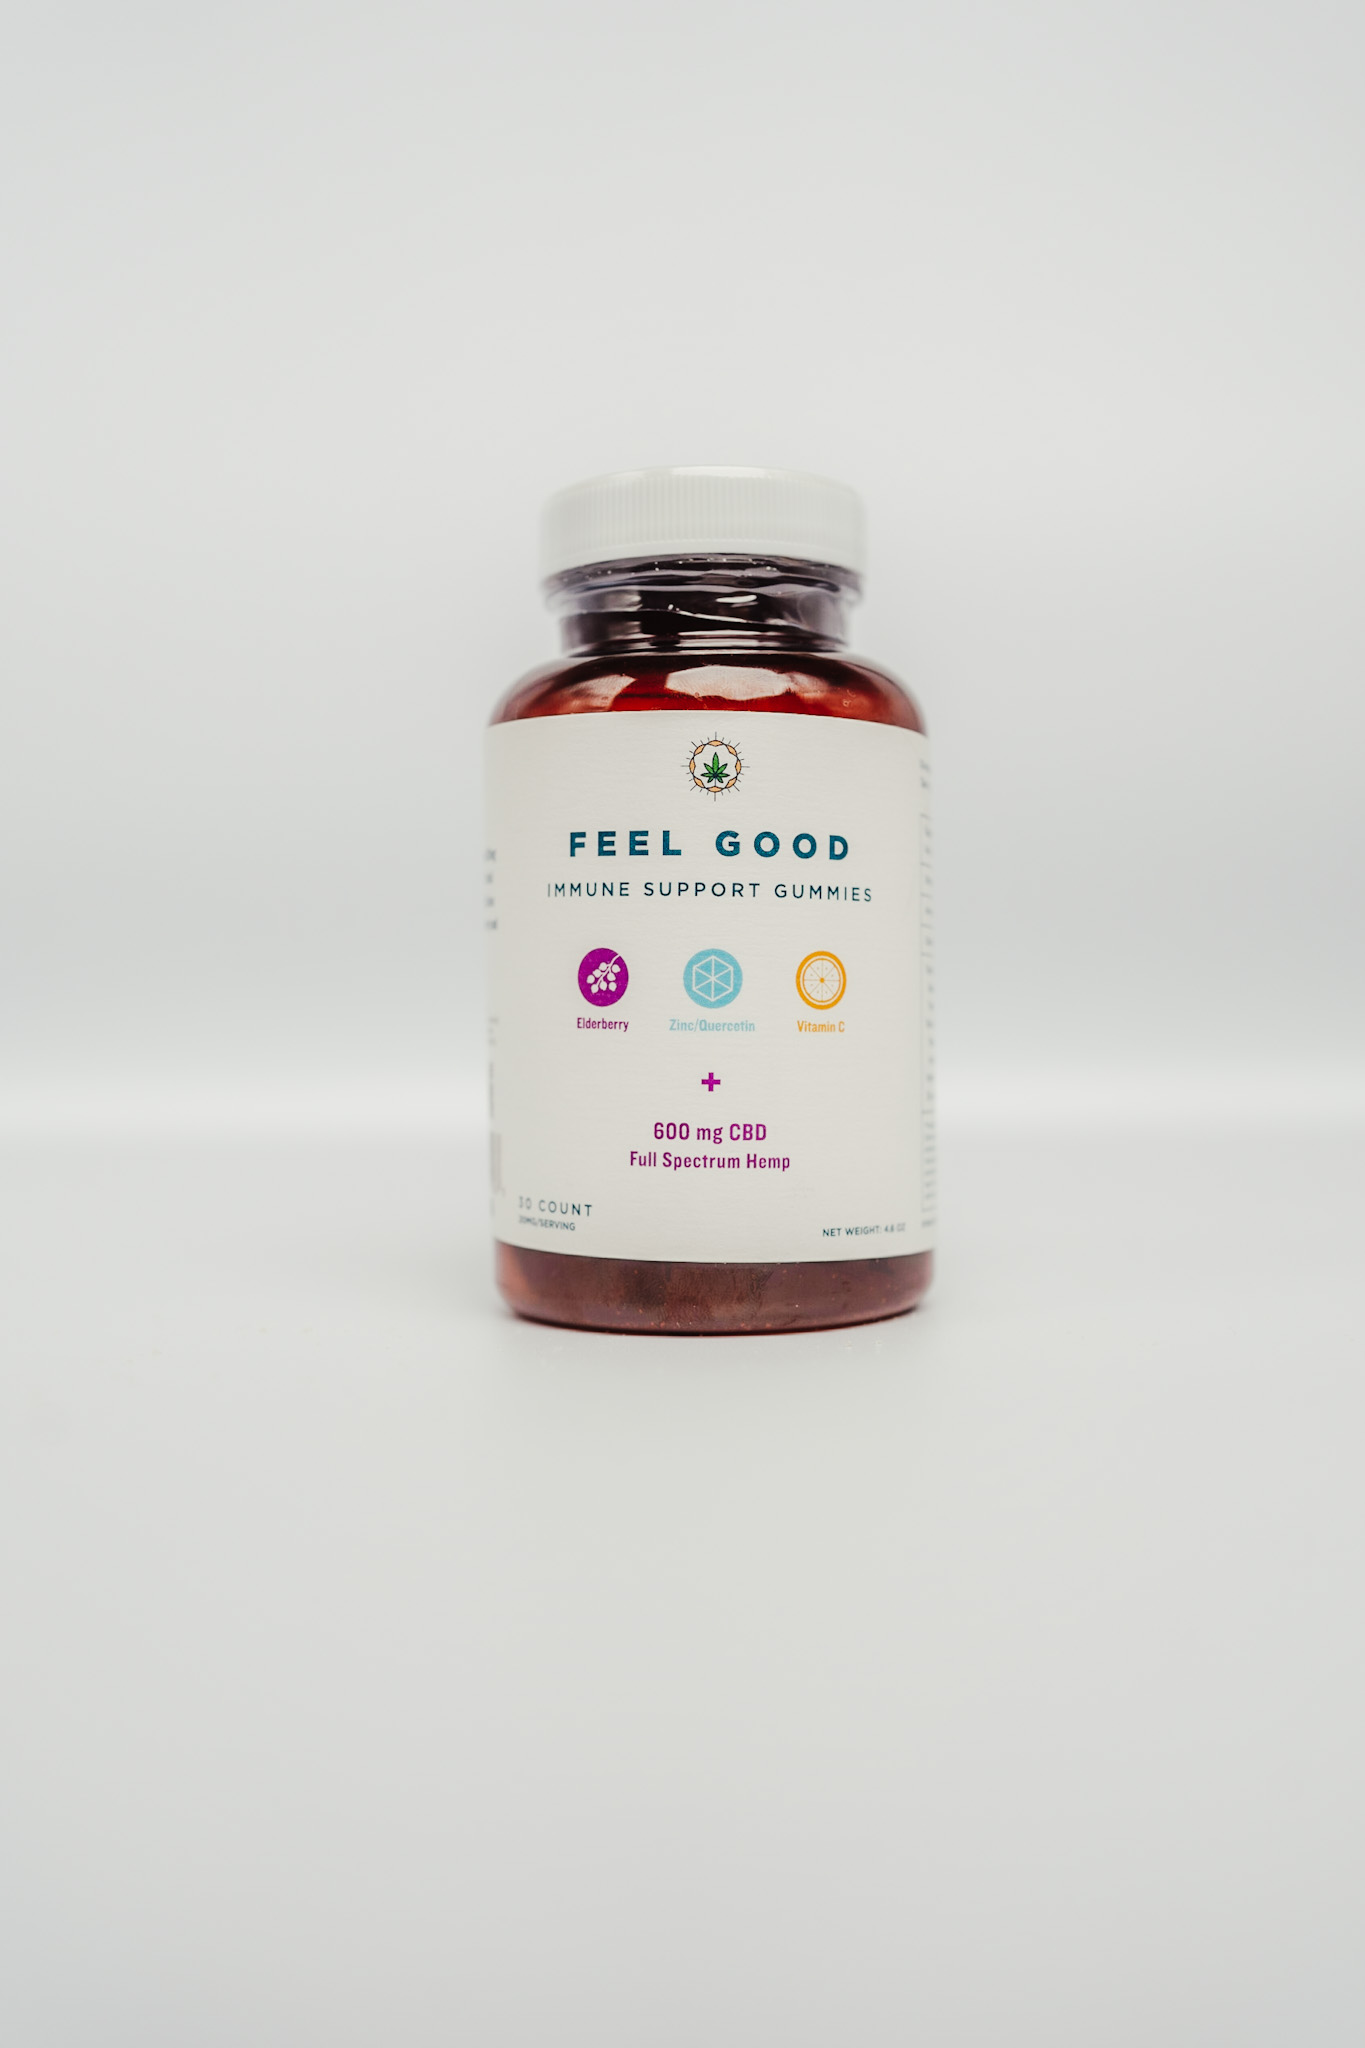 Feel Good Immune Support Full Spectrum Hemp Gummies